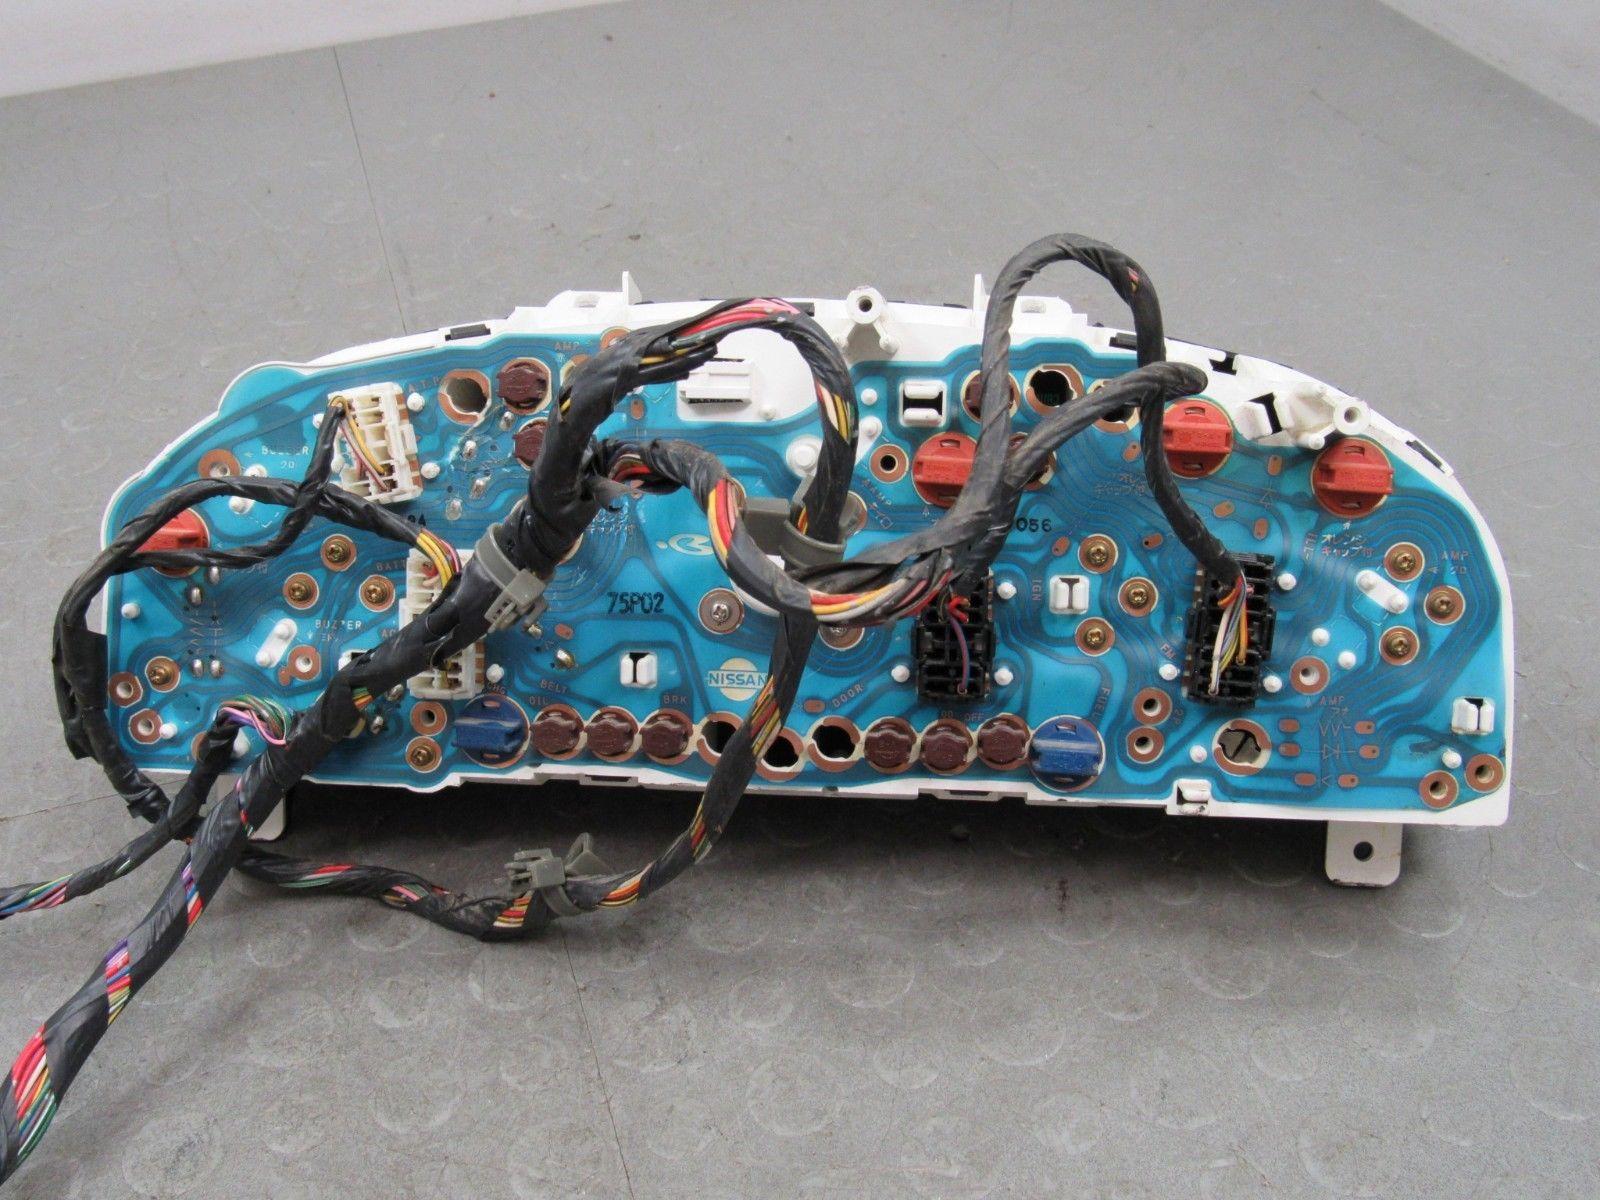 94 97 Nissan Pickup Truck Hard Body Instrument Gauge Cluster Tach Harness 249607